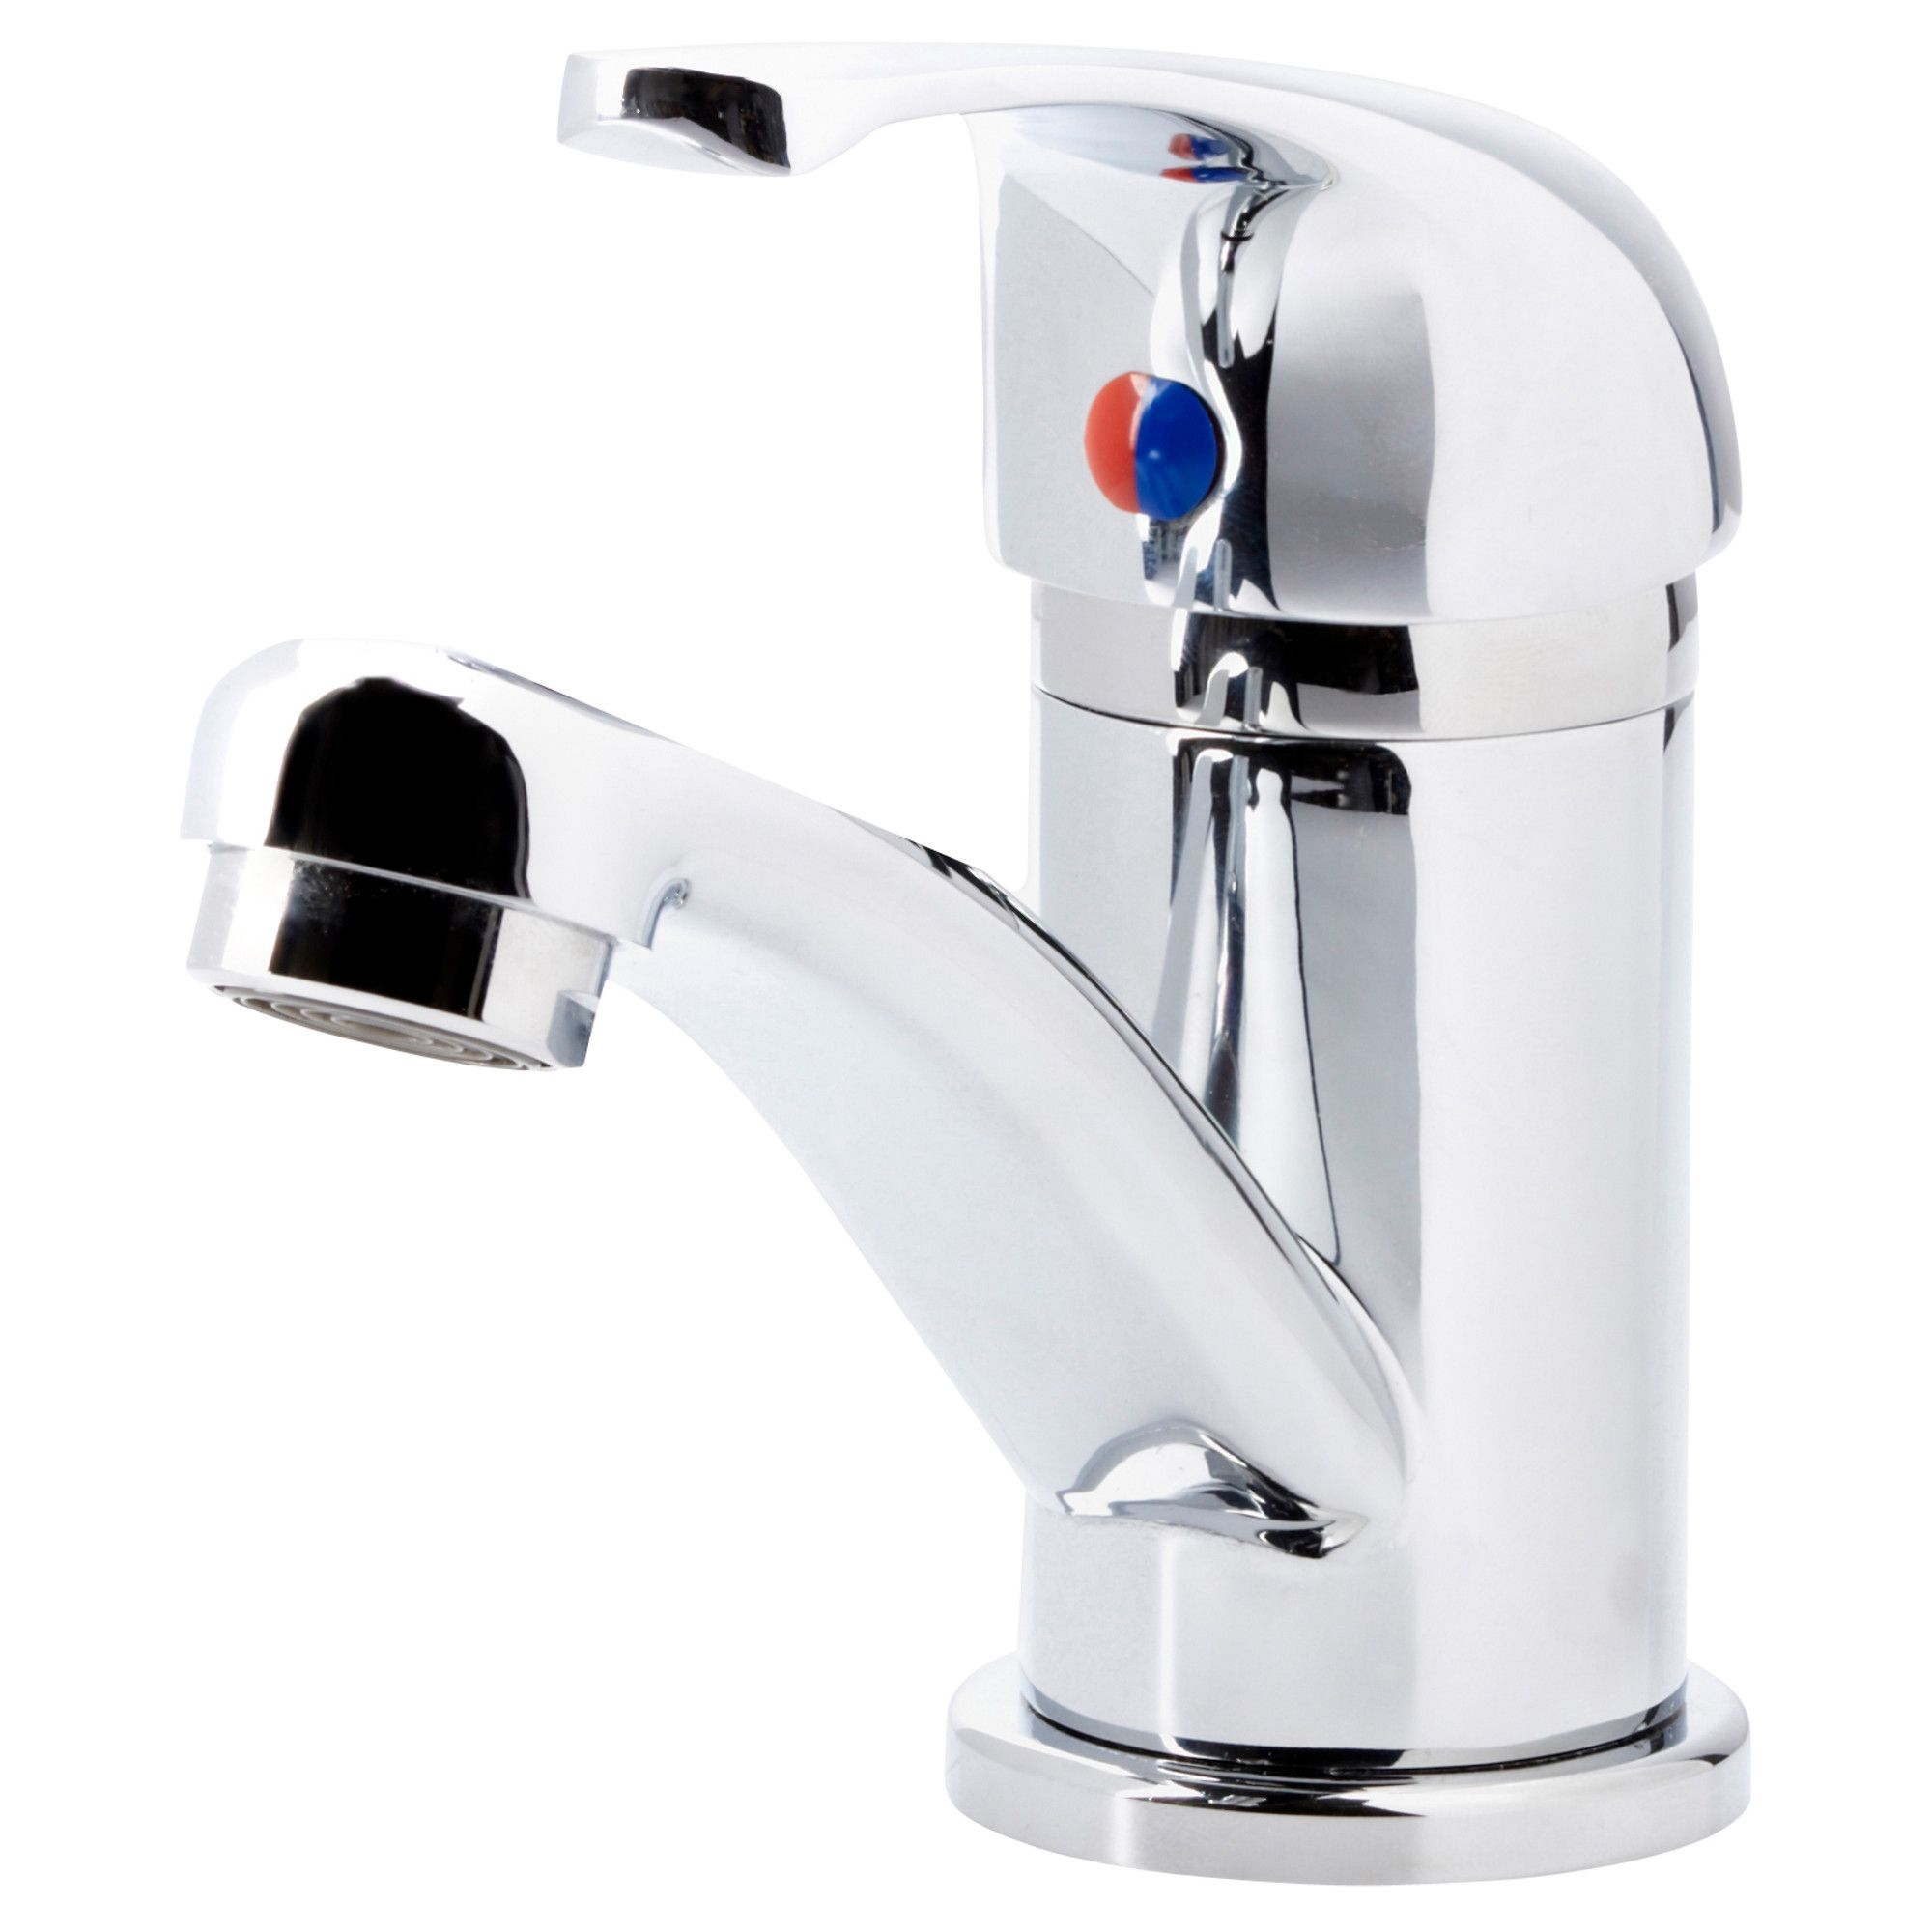 OLSKÄR Mischbatterie/Waschbecken, verchromt   Faucet, Basin mixer ...